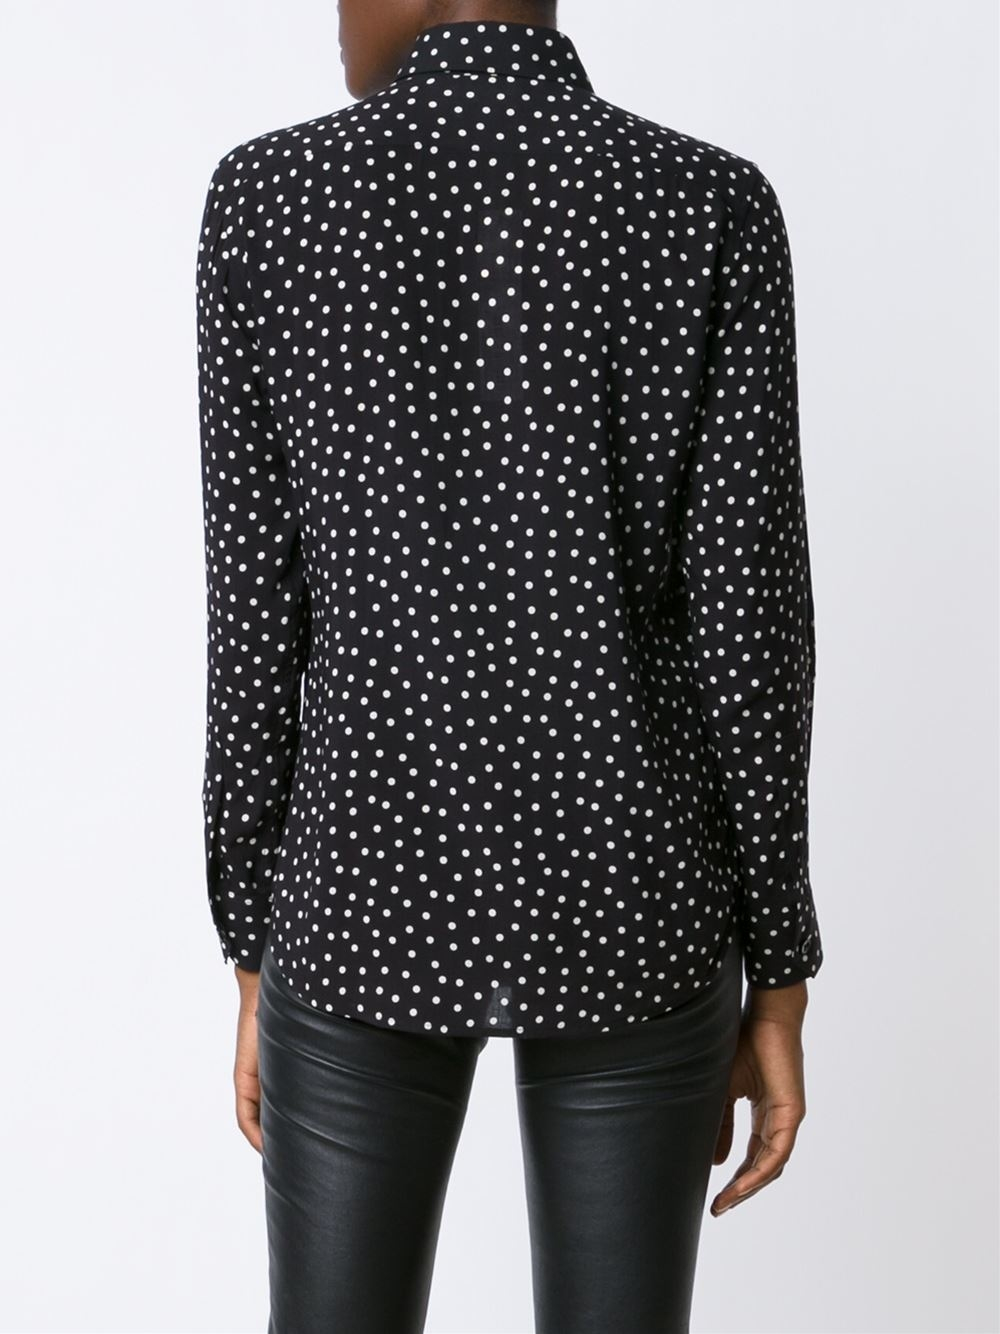 c54f158d04c4dc Lyst - Saint Laurent Polka Dot Dress Shirt in Black